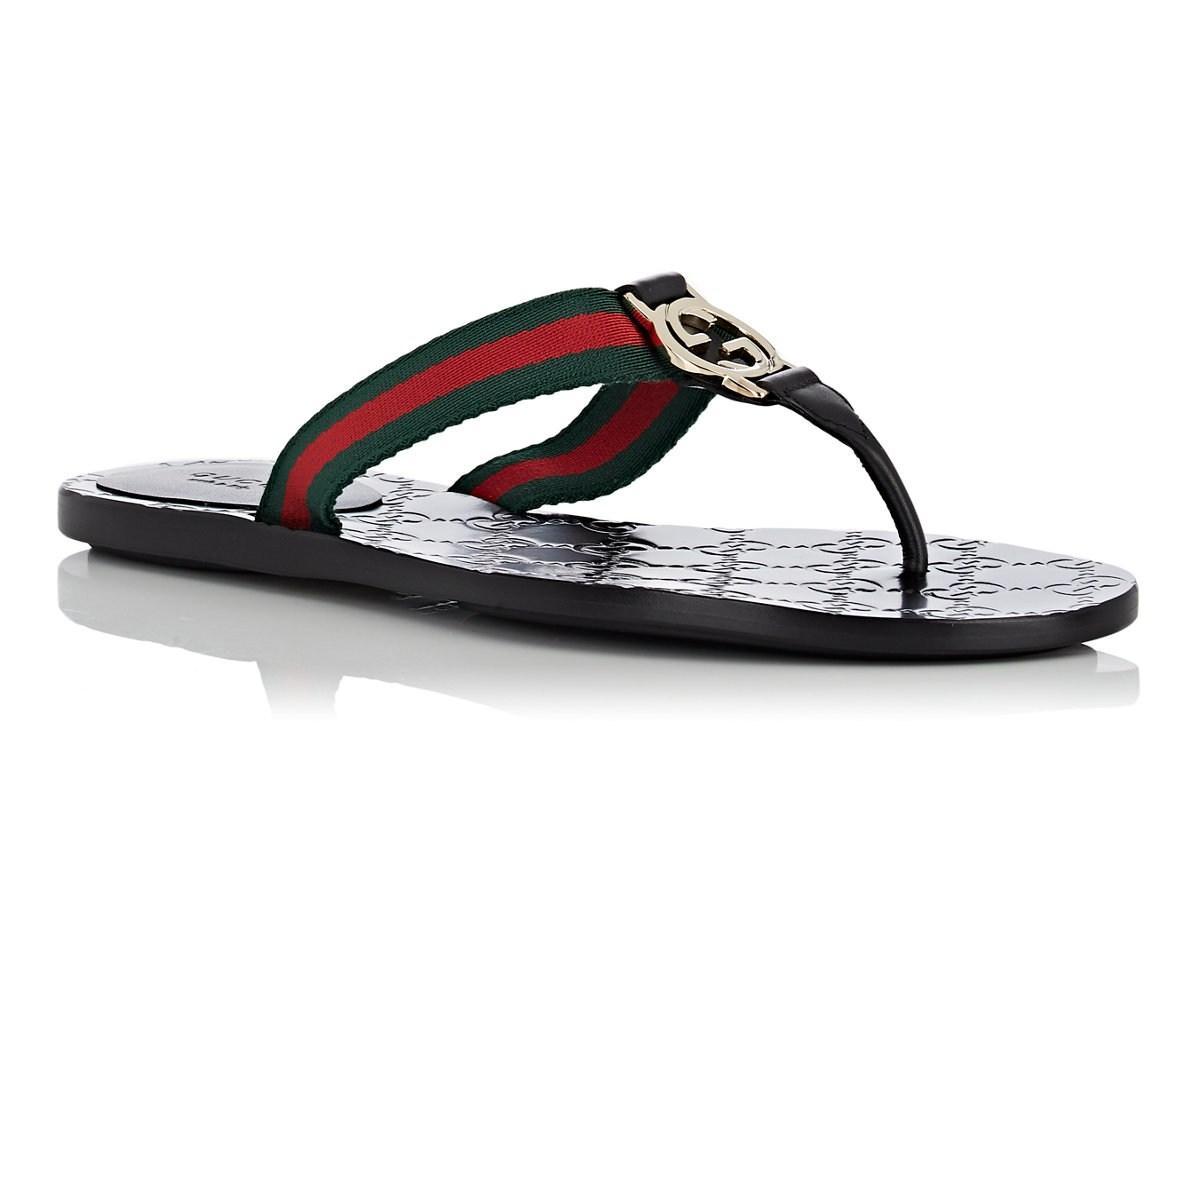 62a16d298930 Gucci - Black Leather   Nylon Thong Sandals - Lyst. View fullscreen